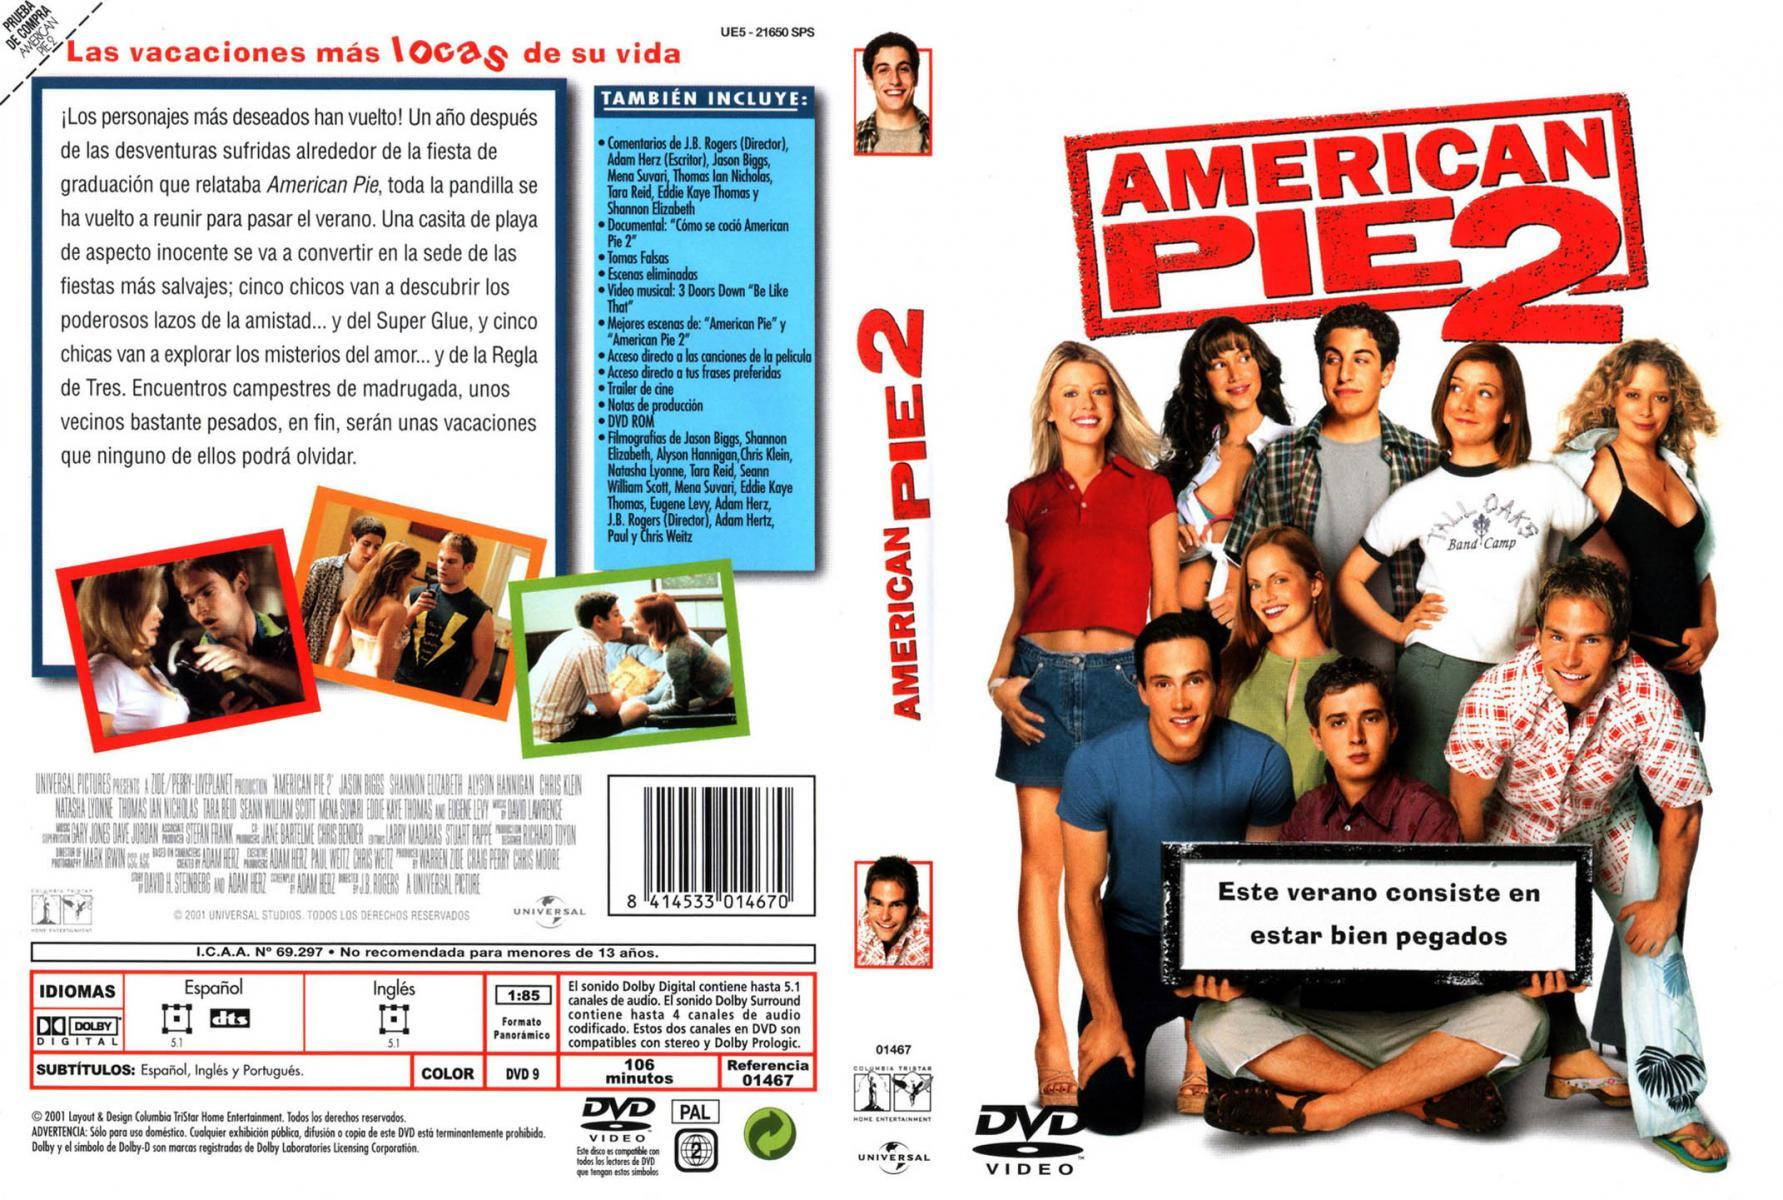 American Pie 2 Español image gallery for american pie 2 - filmaffinity